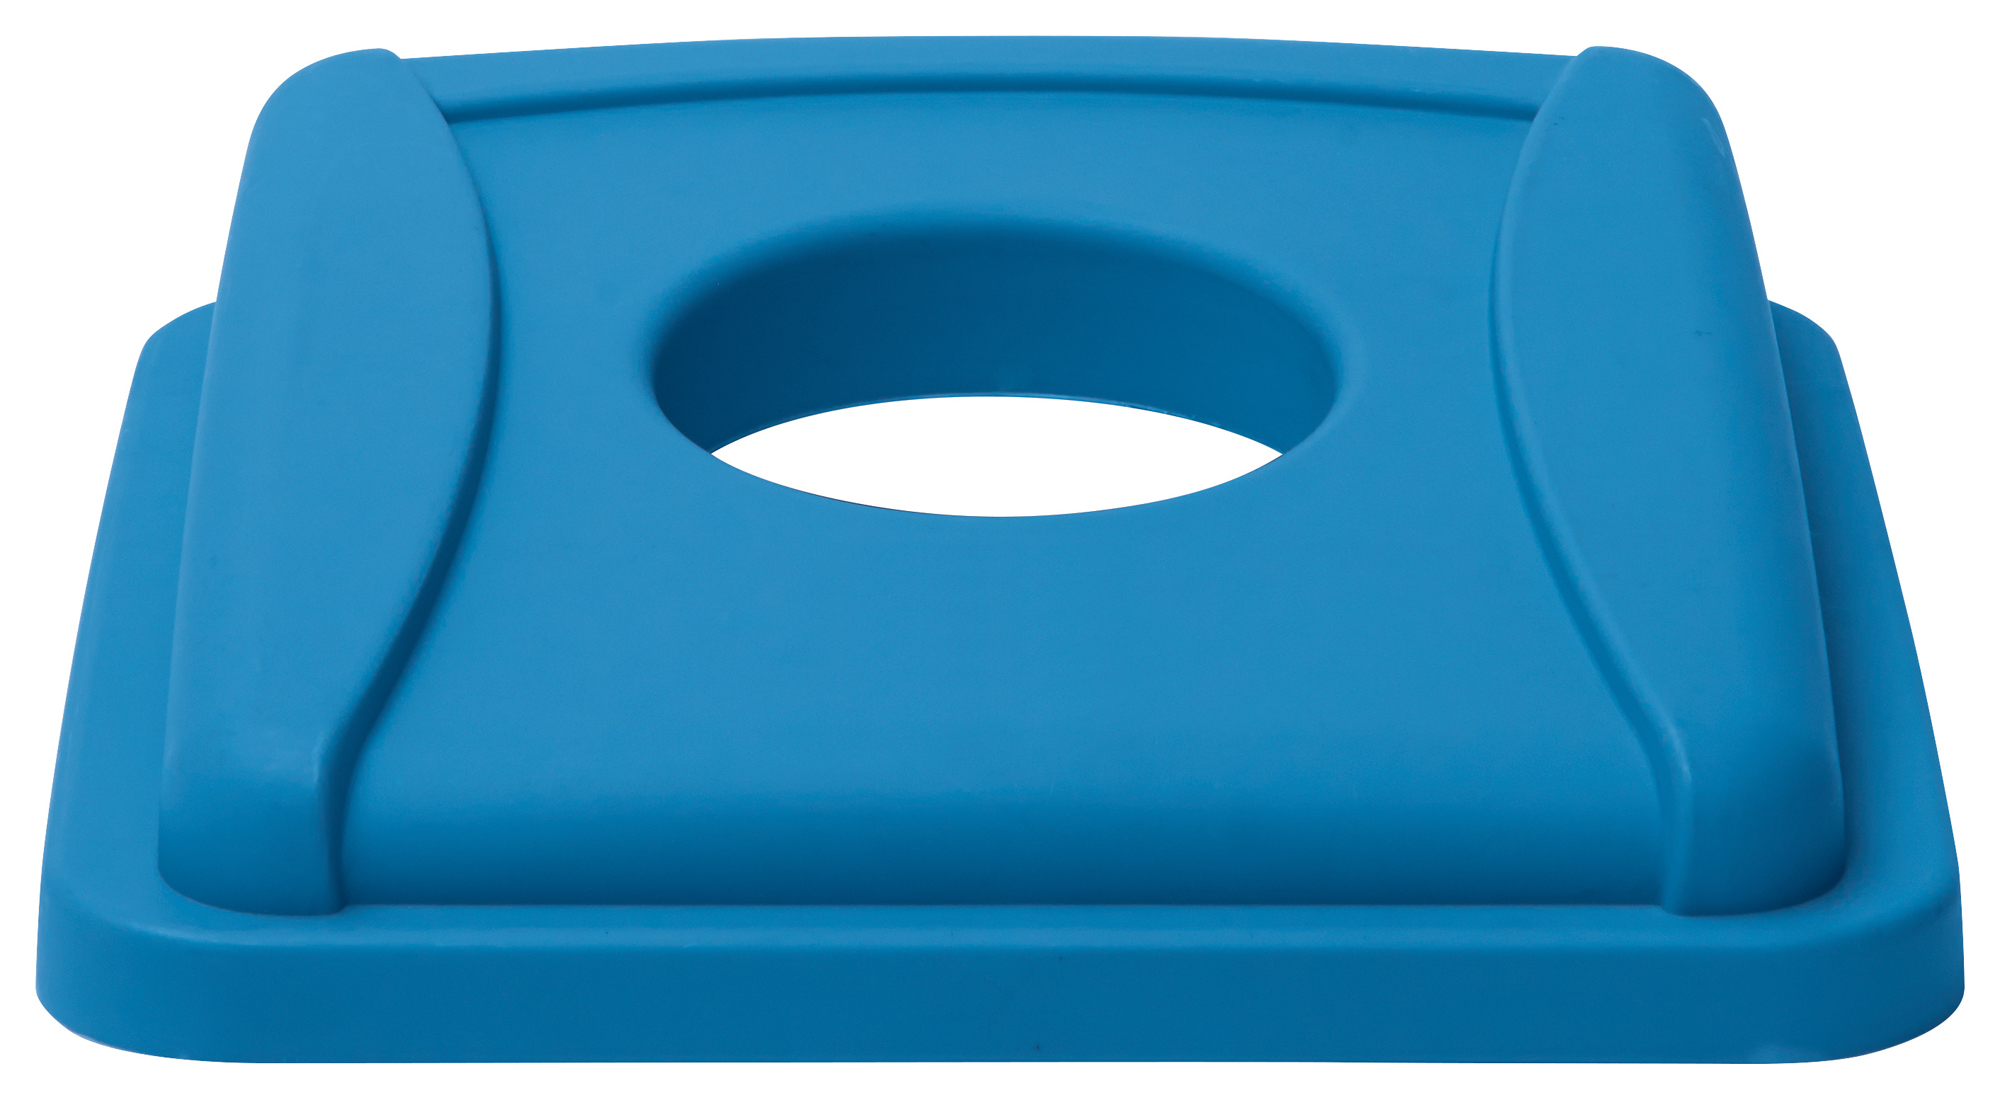 Winco PTCSB-23L trash cans & accessories